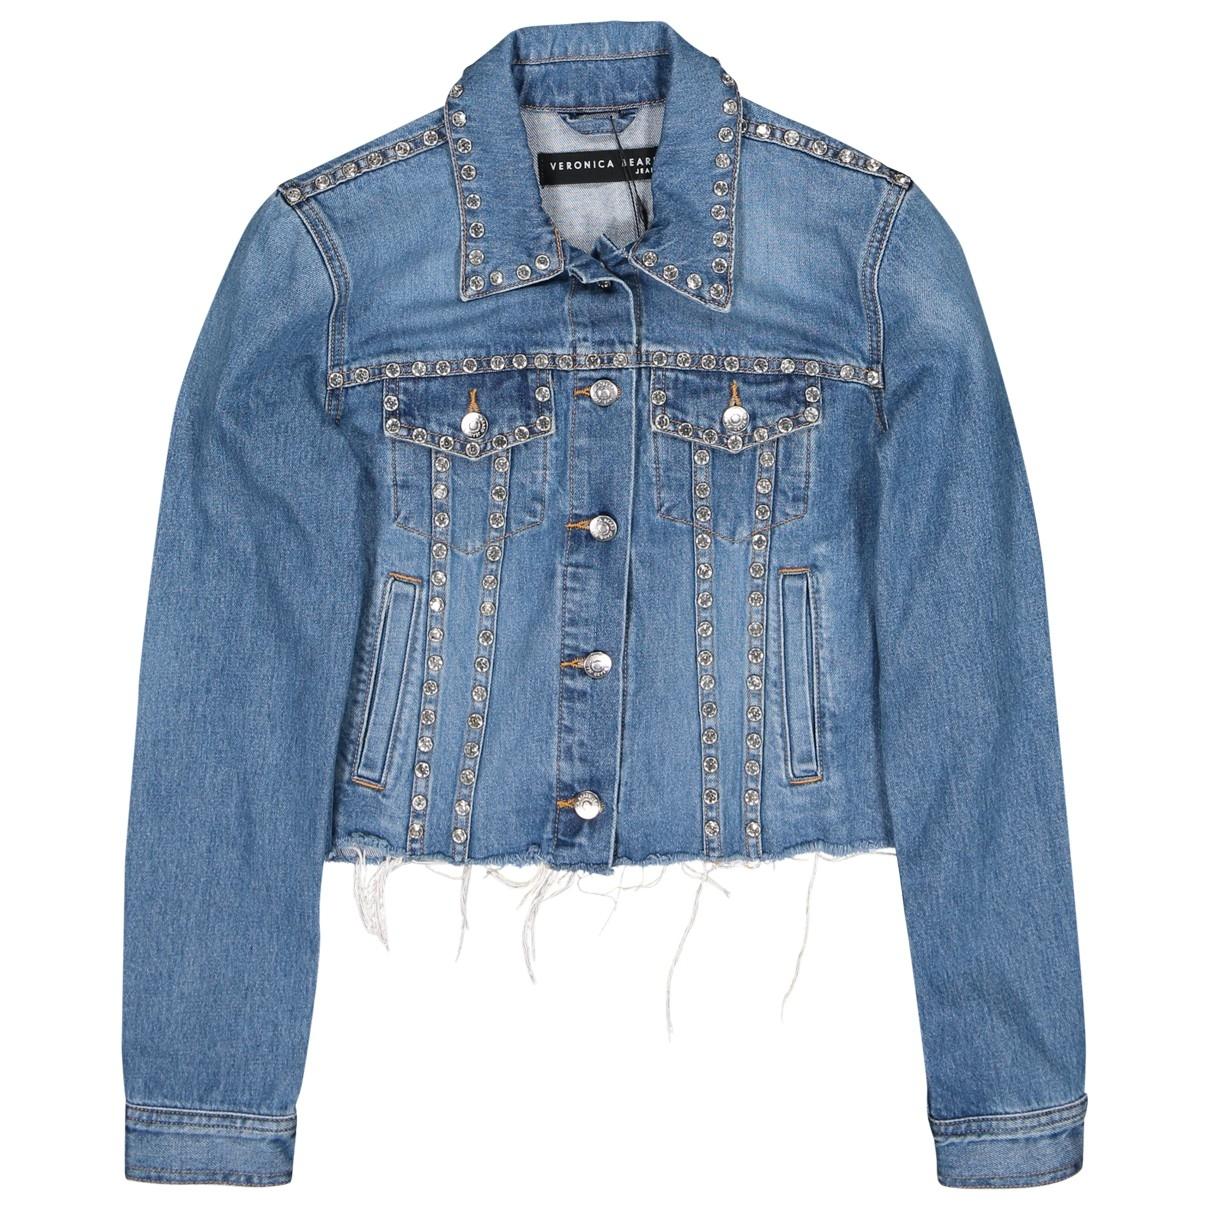 Veronica Beard \N Blue Cotton jacket for Women S International